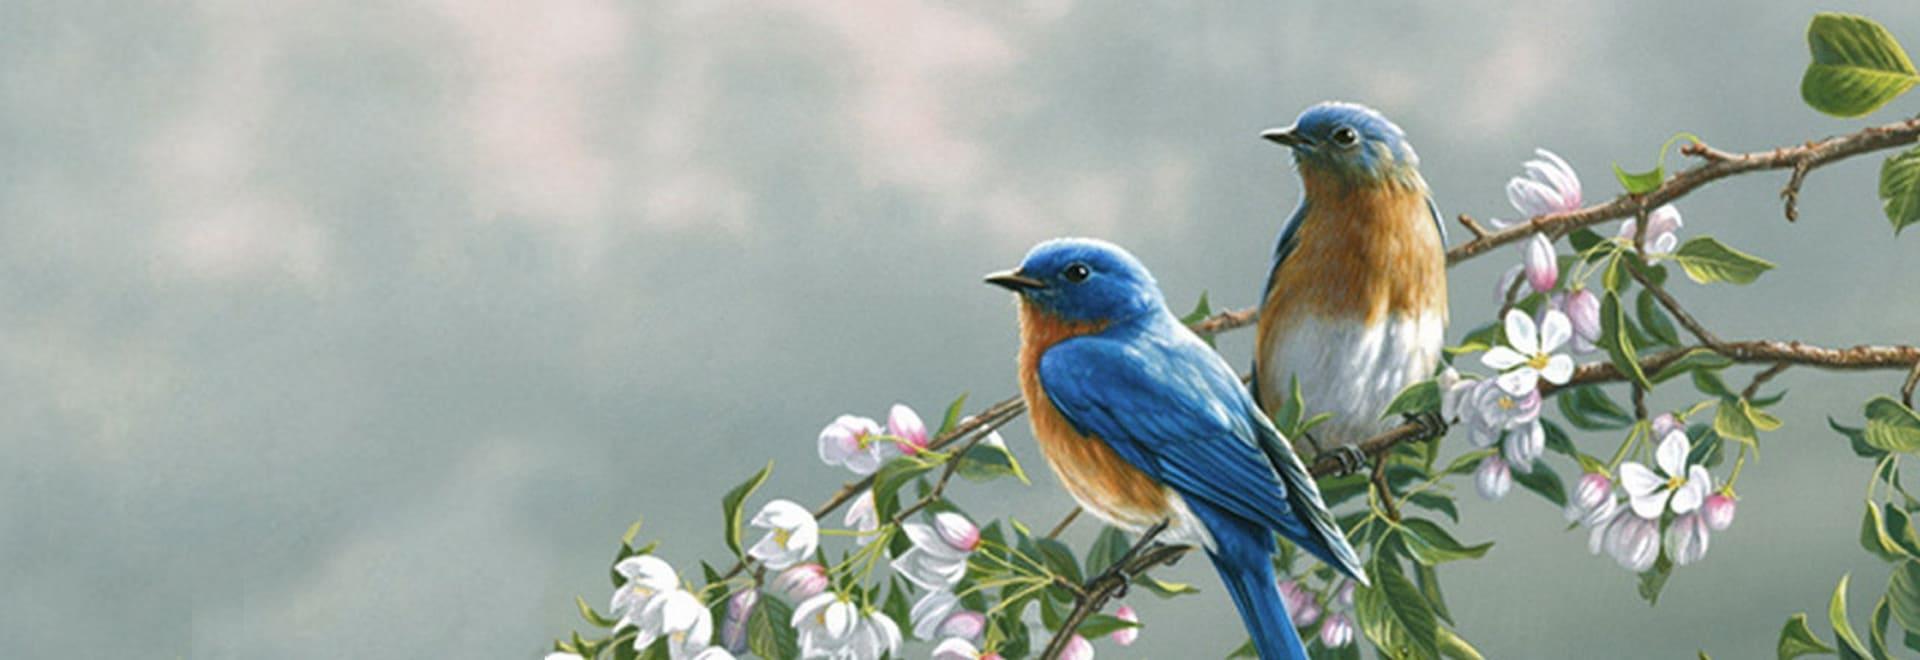 herend rothschild uccelli porcellana ungherese decorata a mano